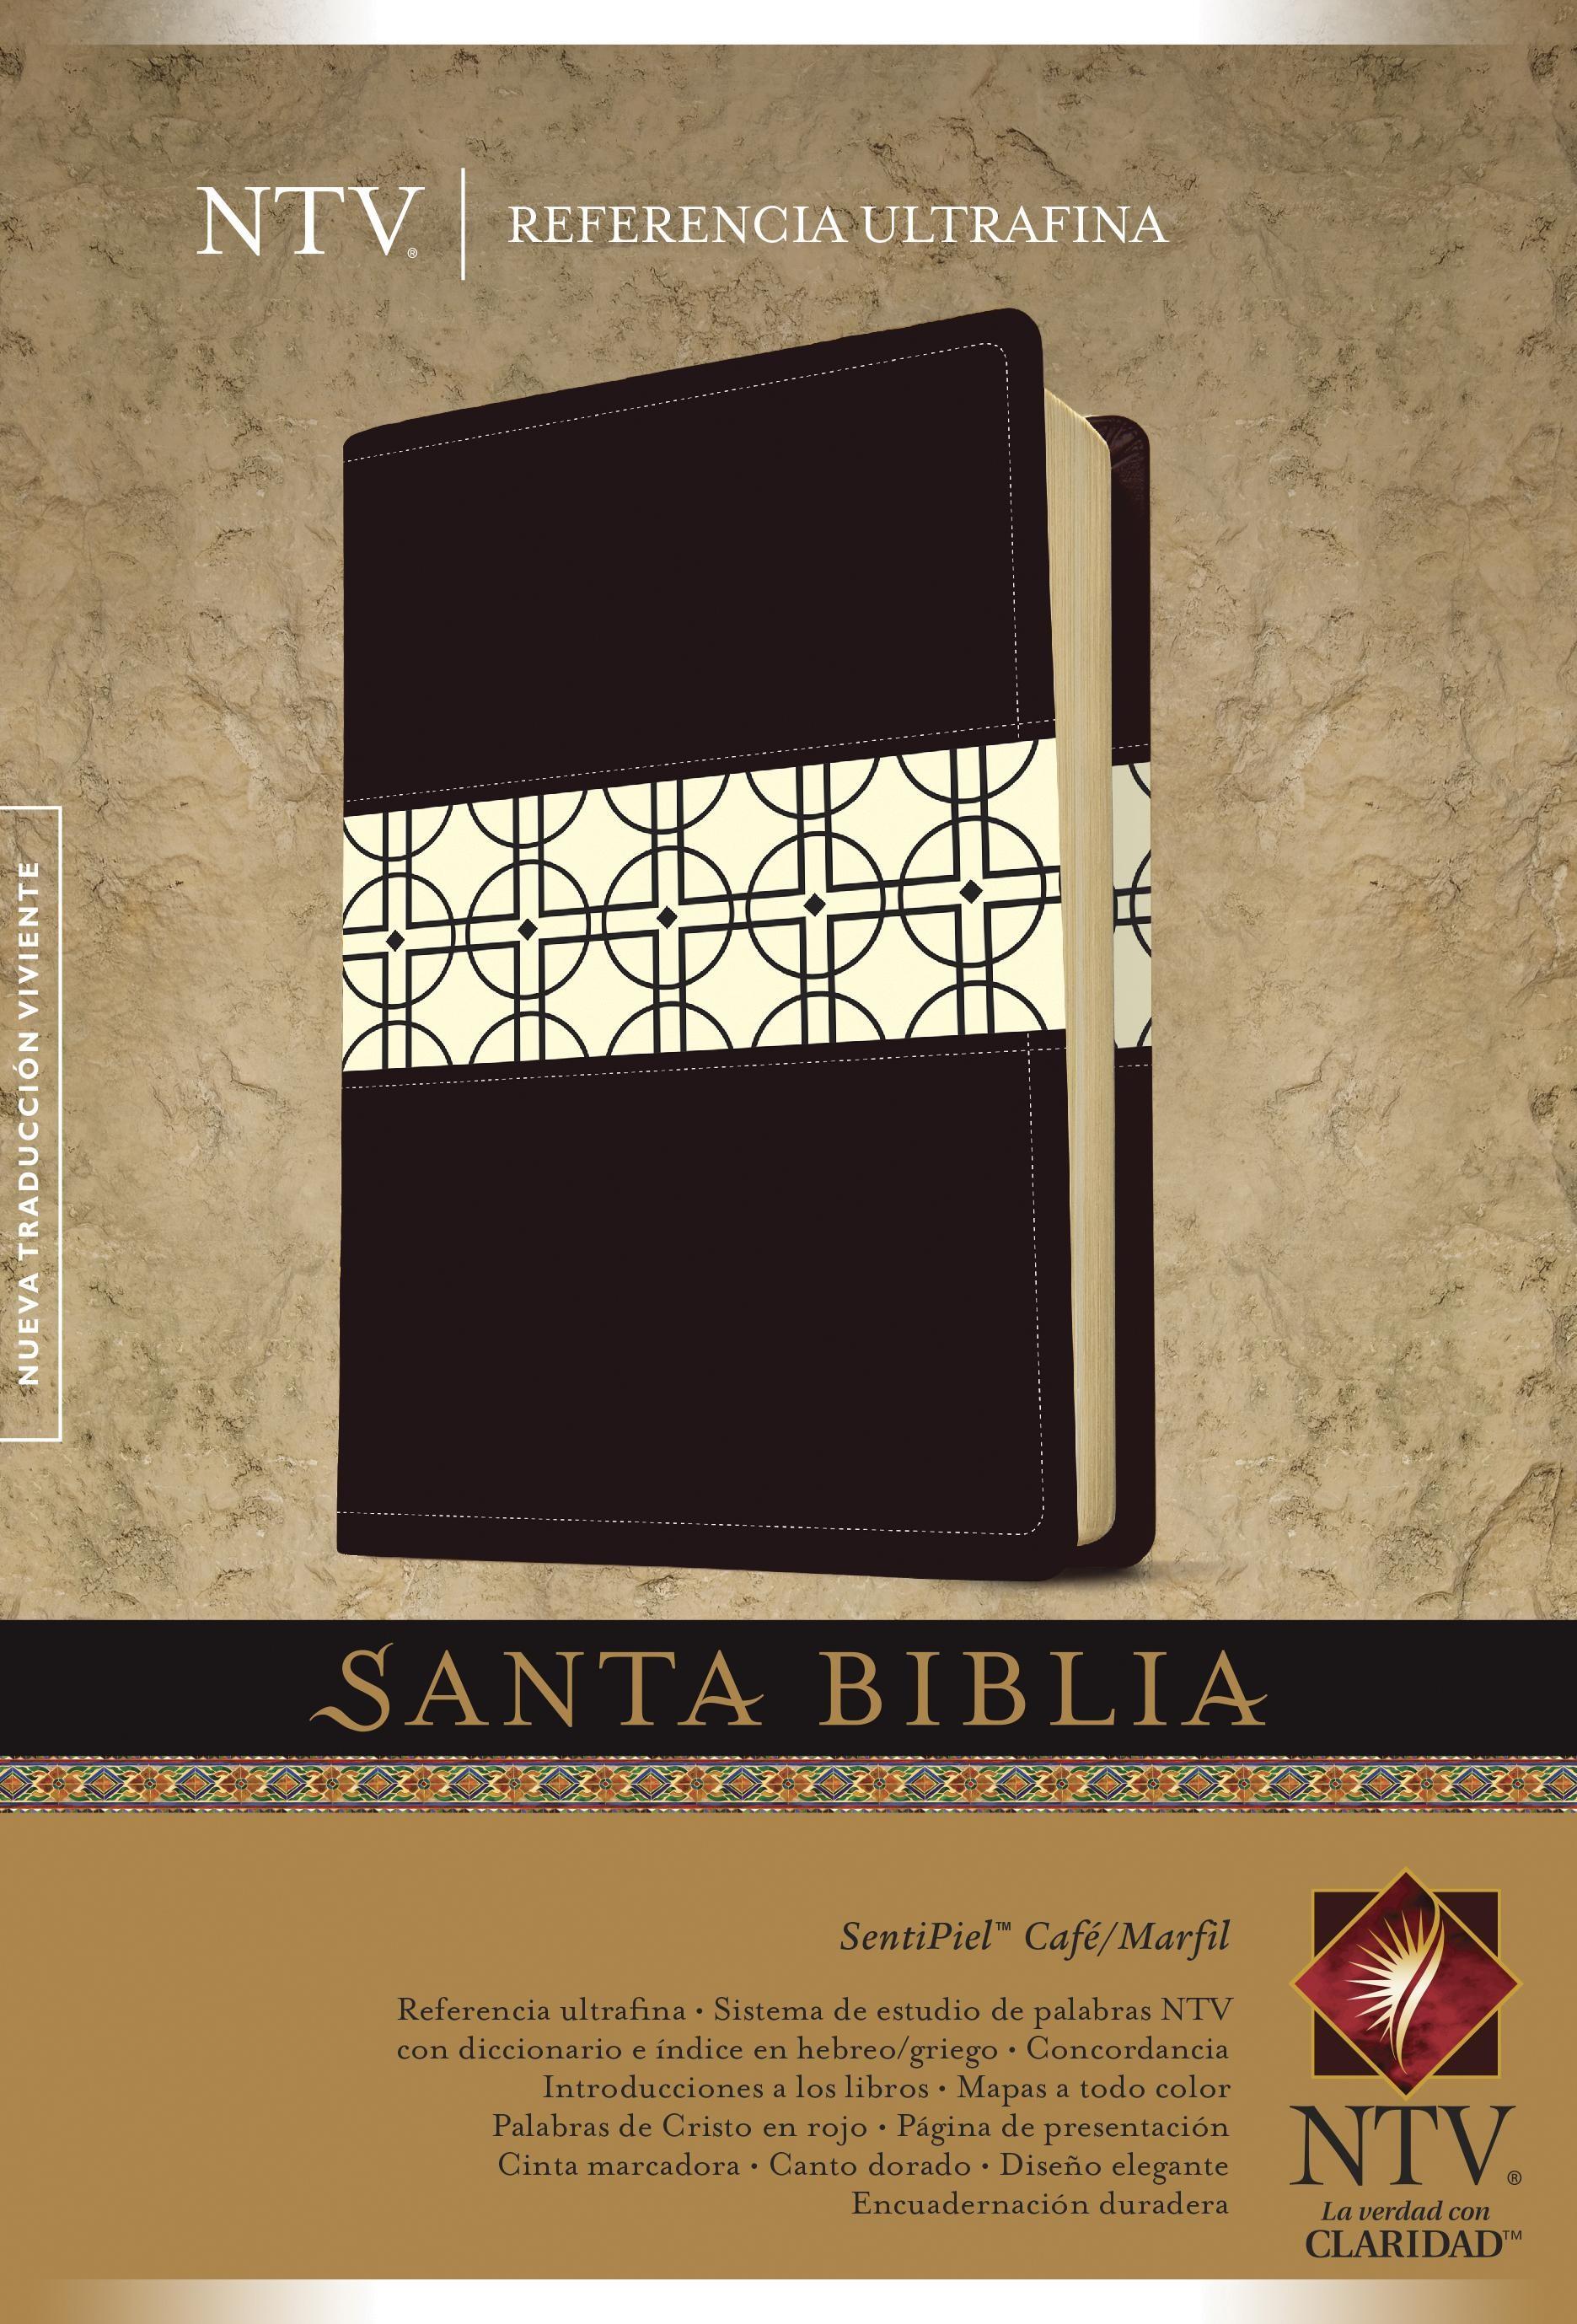 Santa Biblia NTV, Edición de referencia ultrafina, DuoTono (Letra Roja, SentiPiel, Café/Marfil)